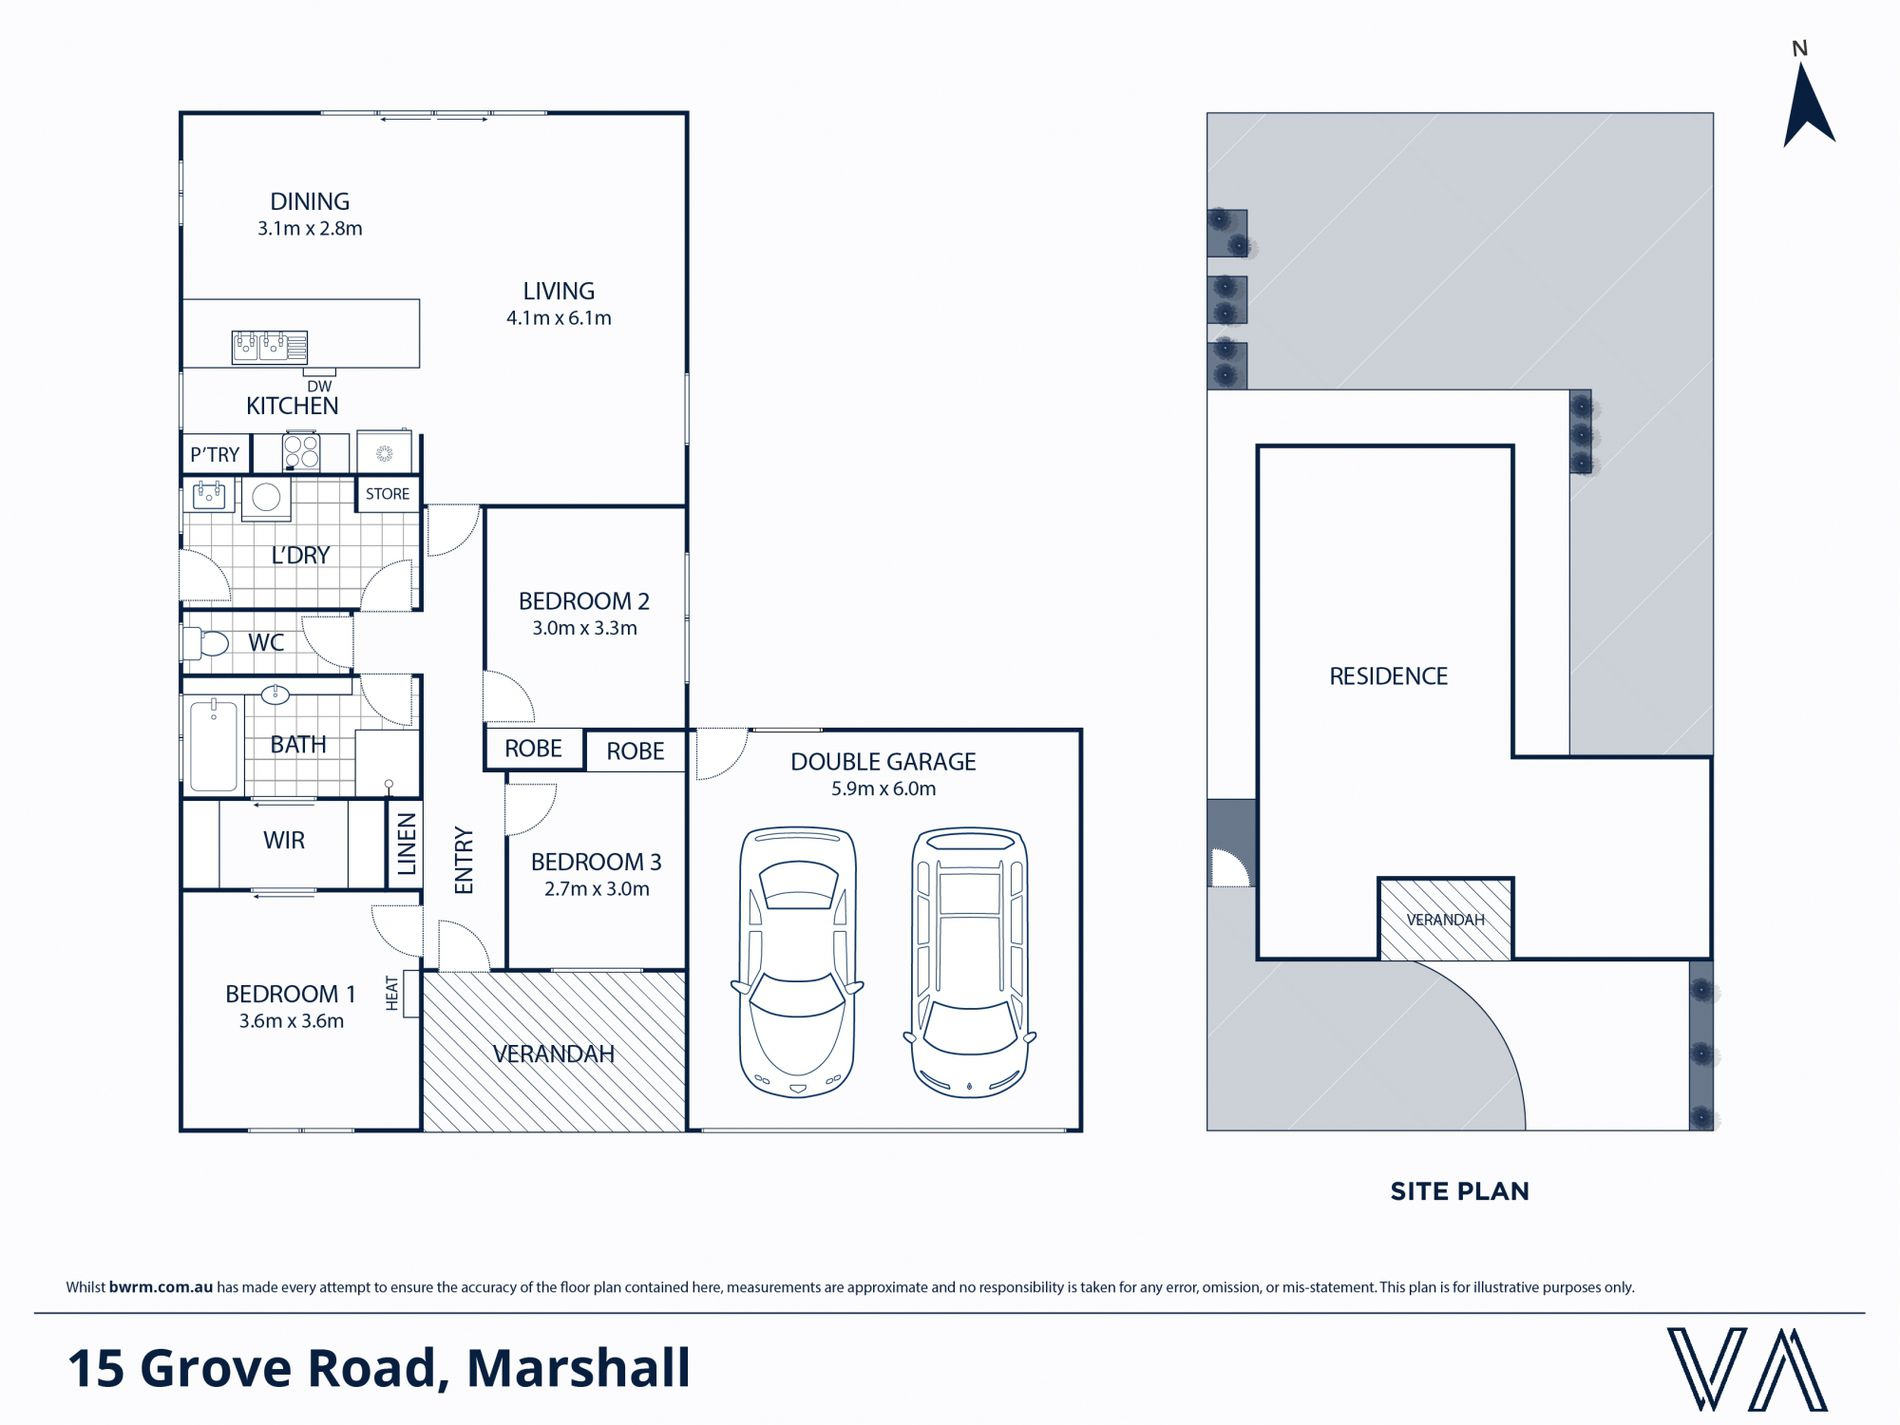 15 Grove Road, Marshall